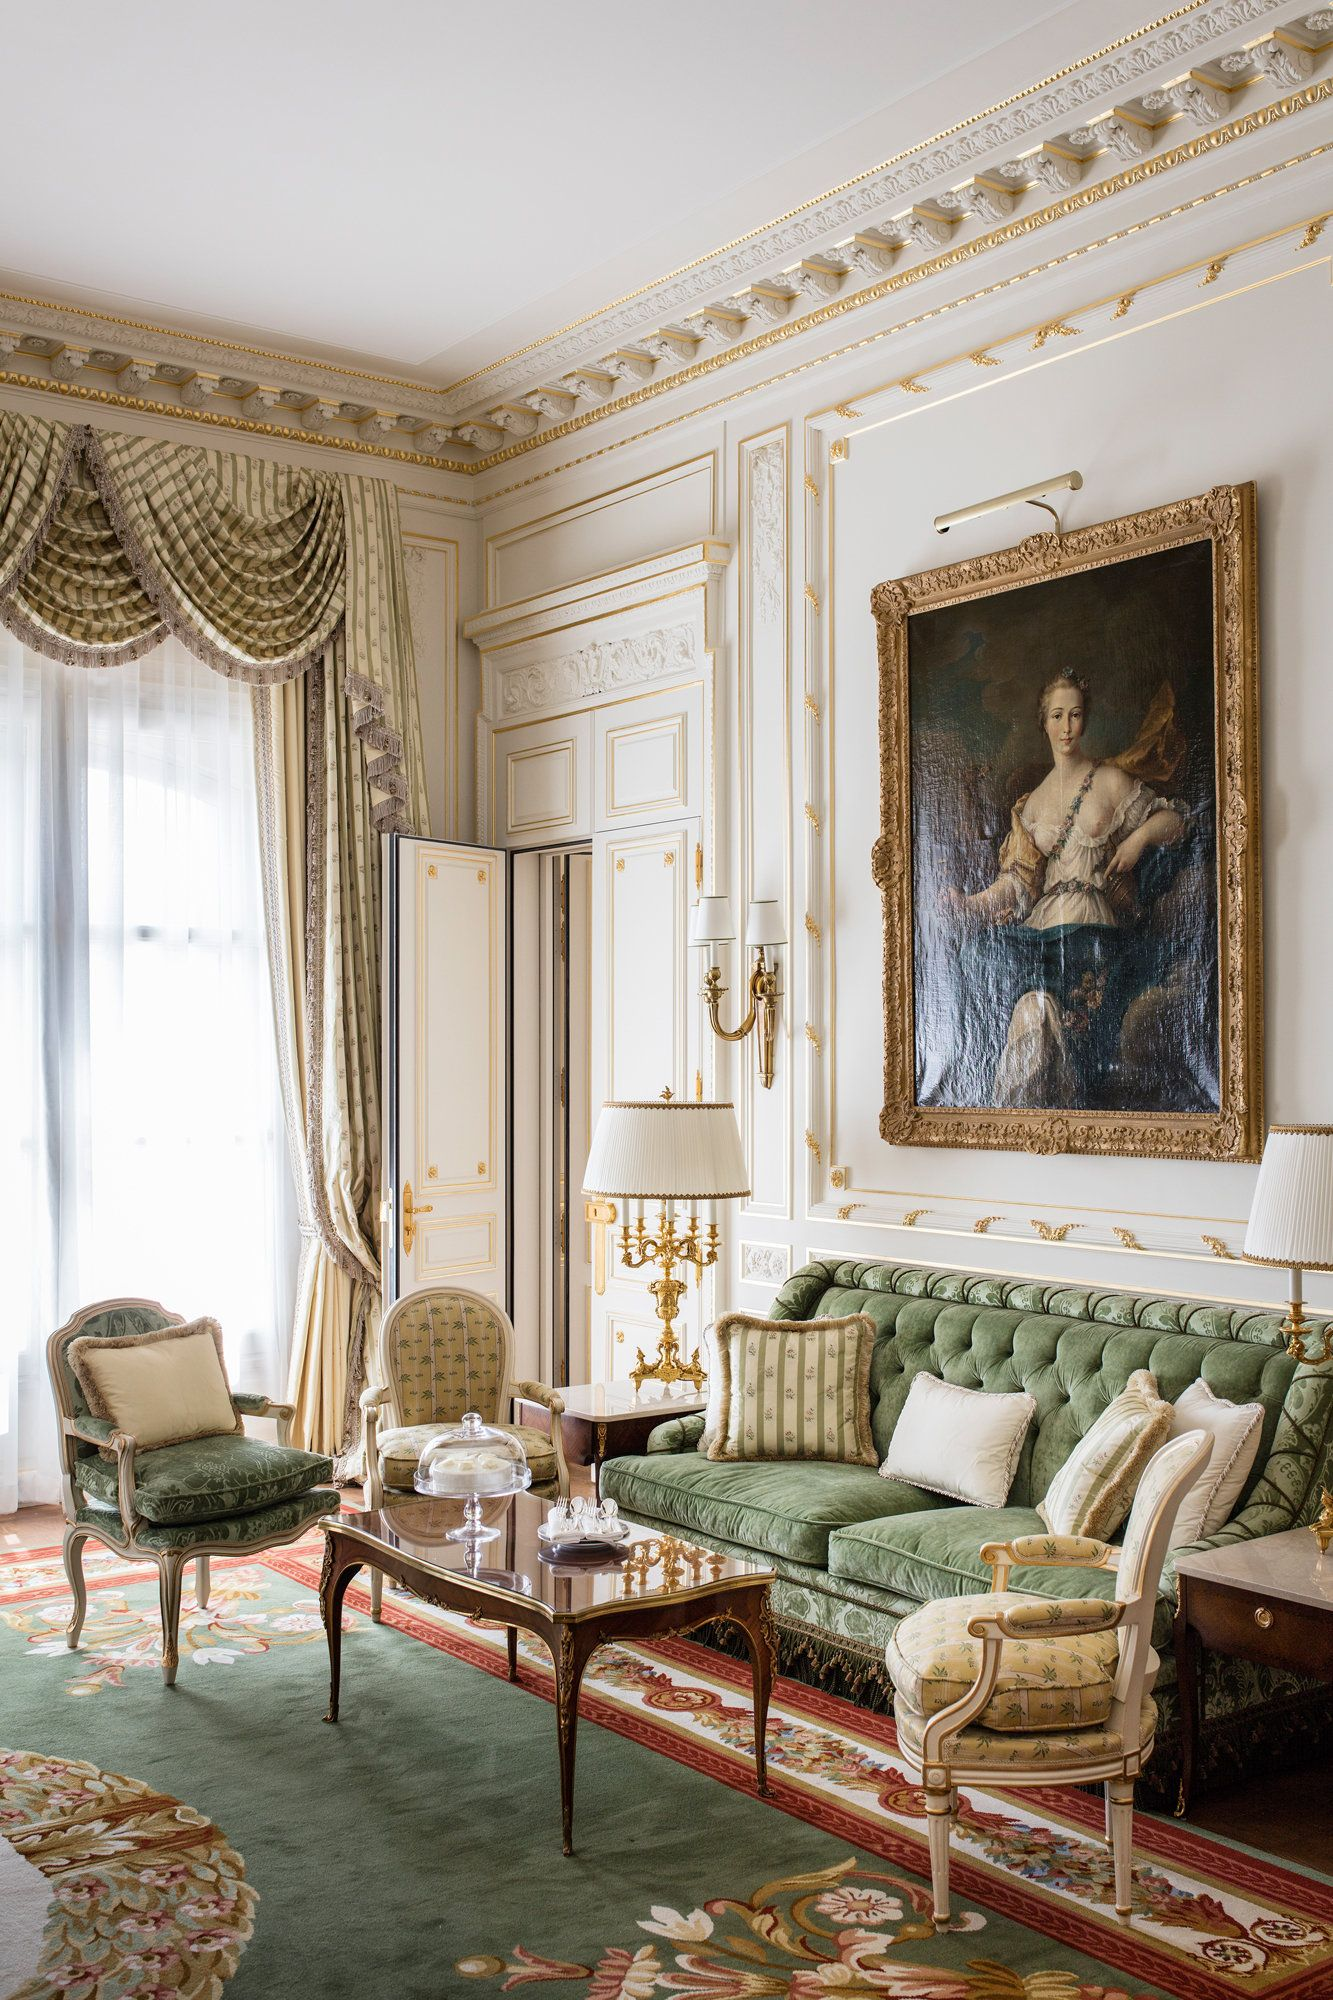 Exploring the Renovated Ritz Paris | Paris, Home Renovation and Doors